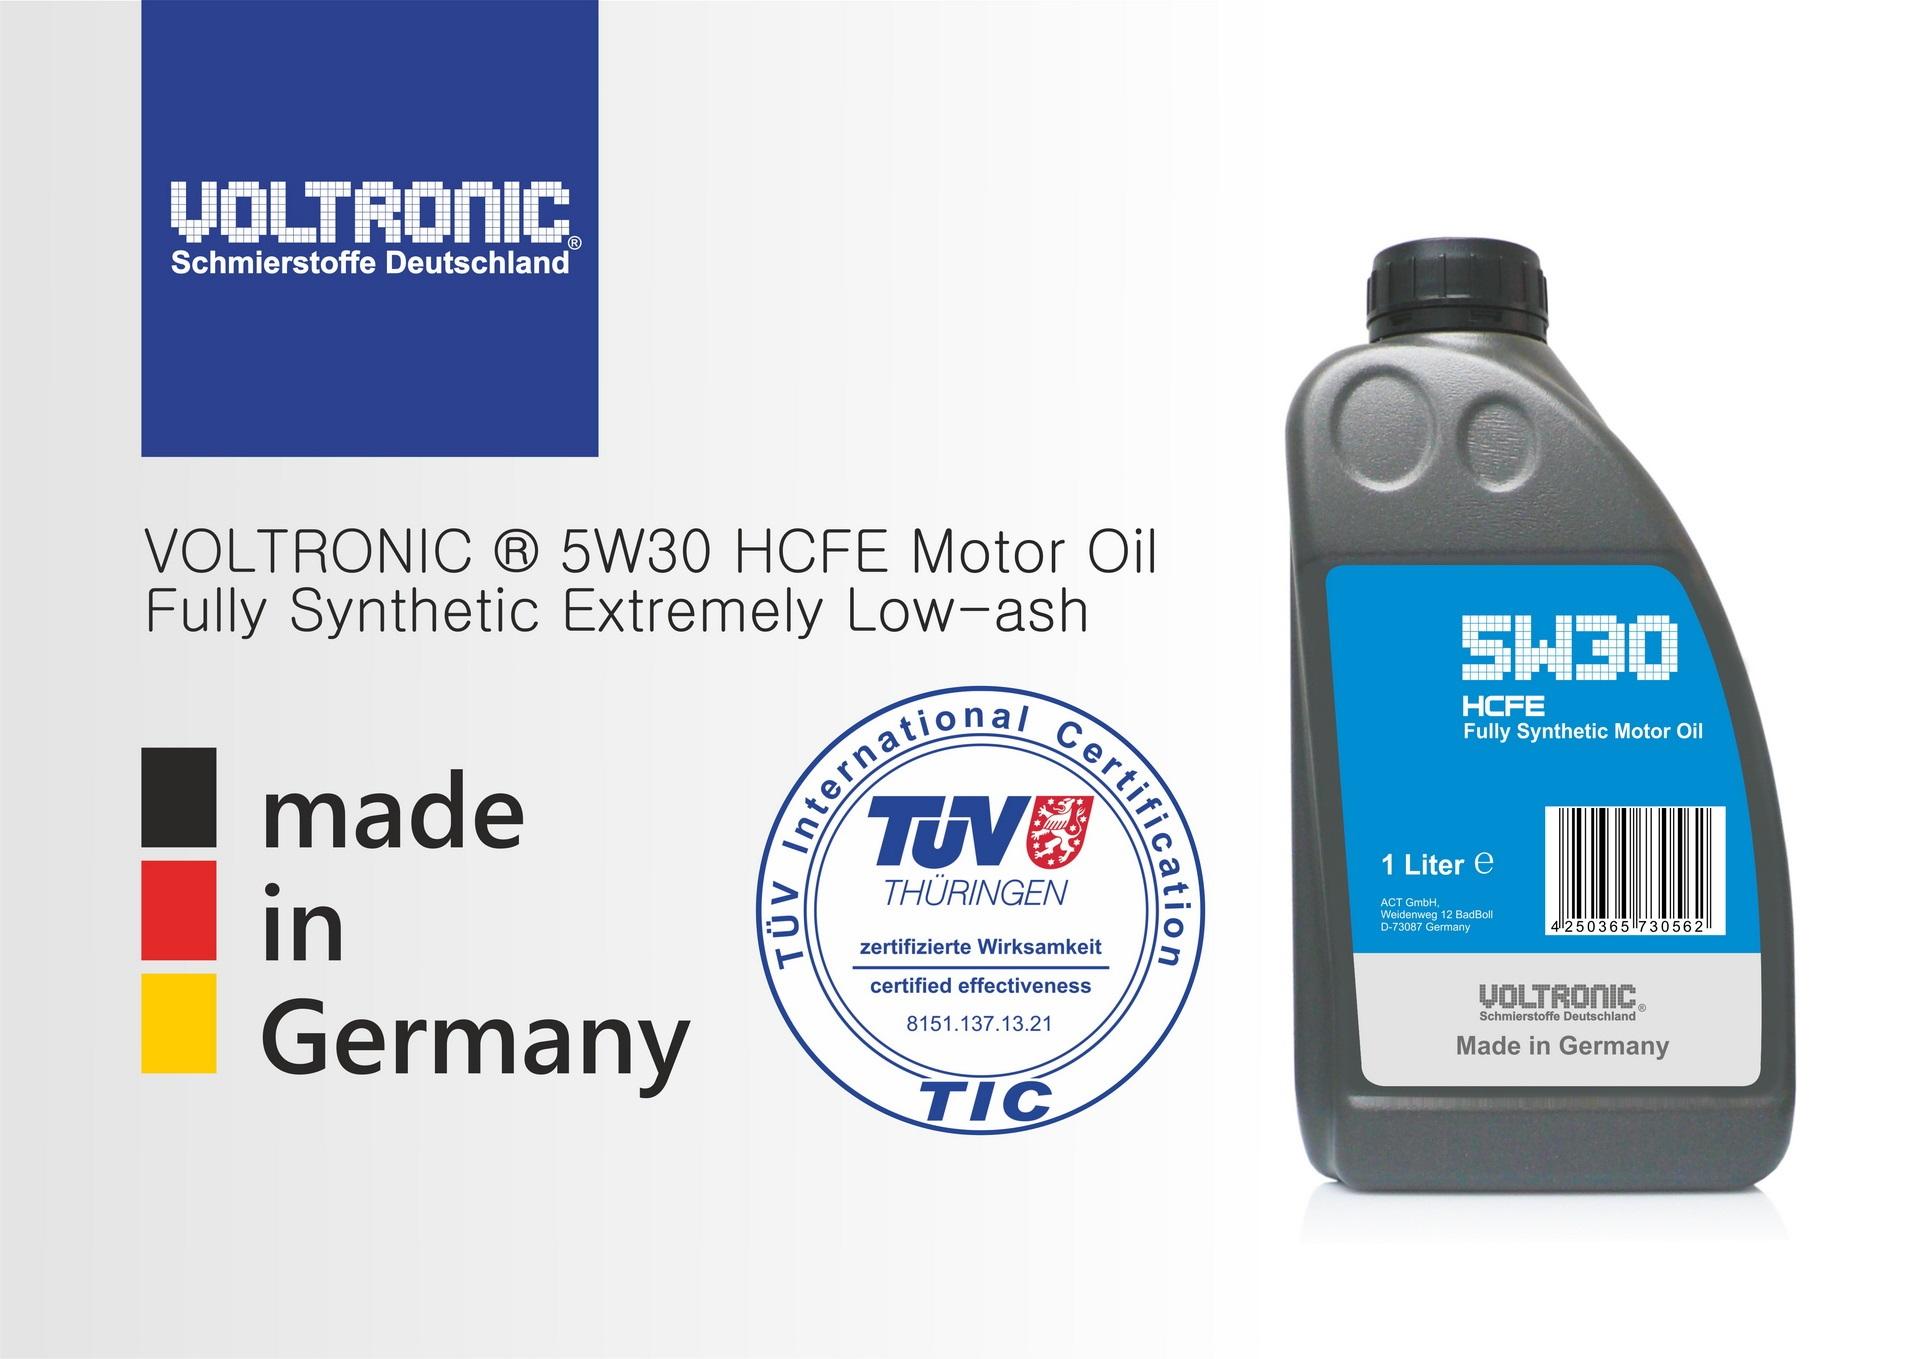 voltronic 5W30 HCFE motor oil TÜV certified